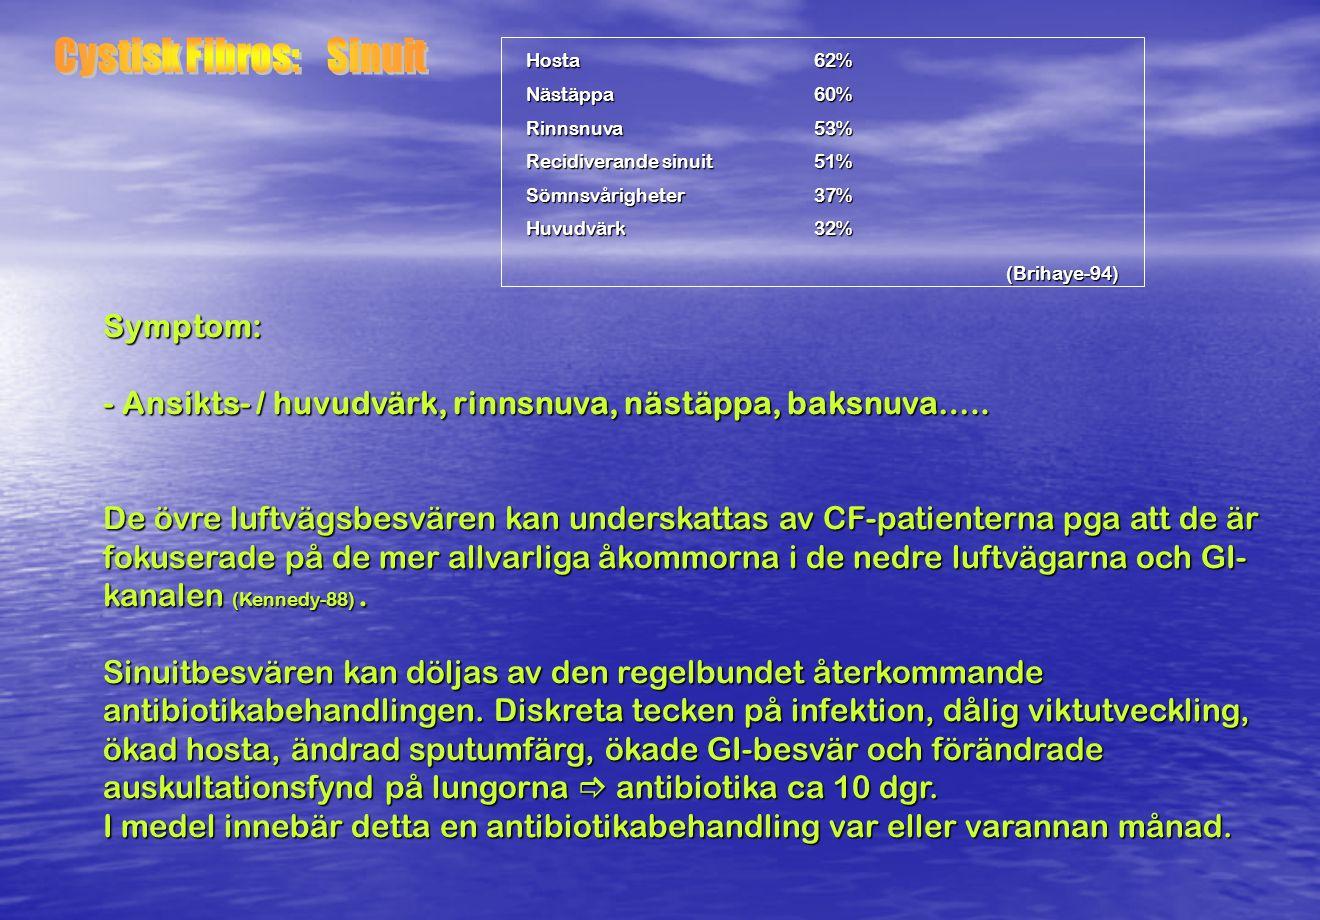 Cystisk Fibros: Sinuit